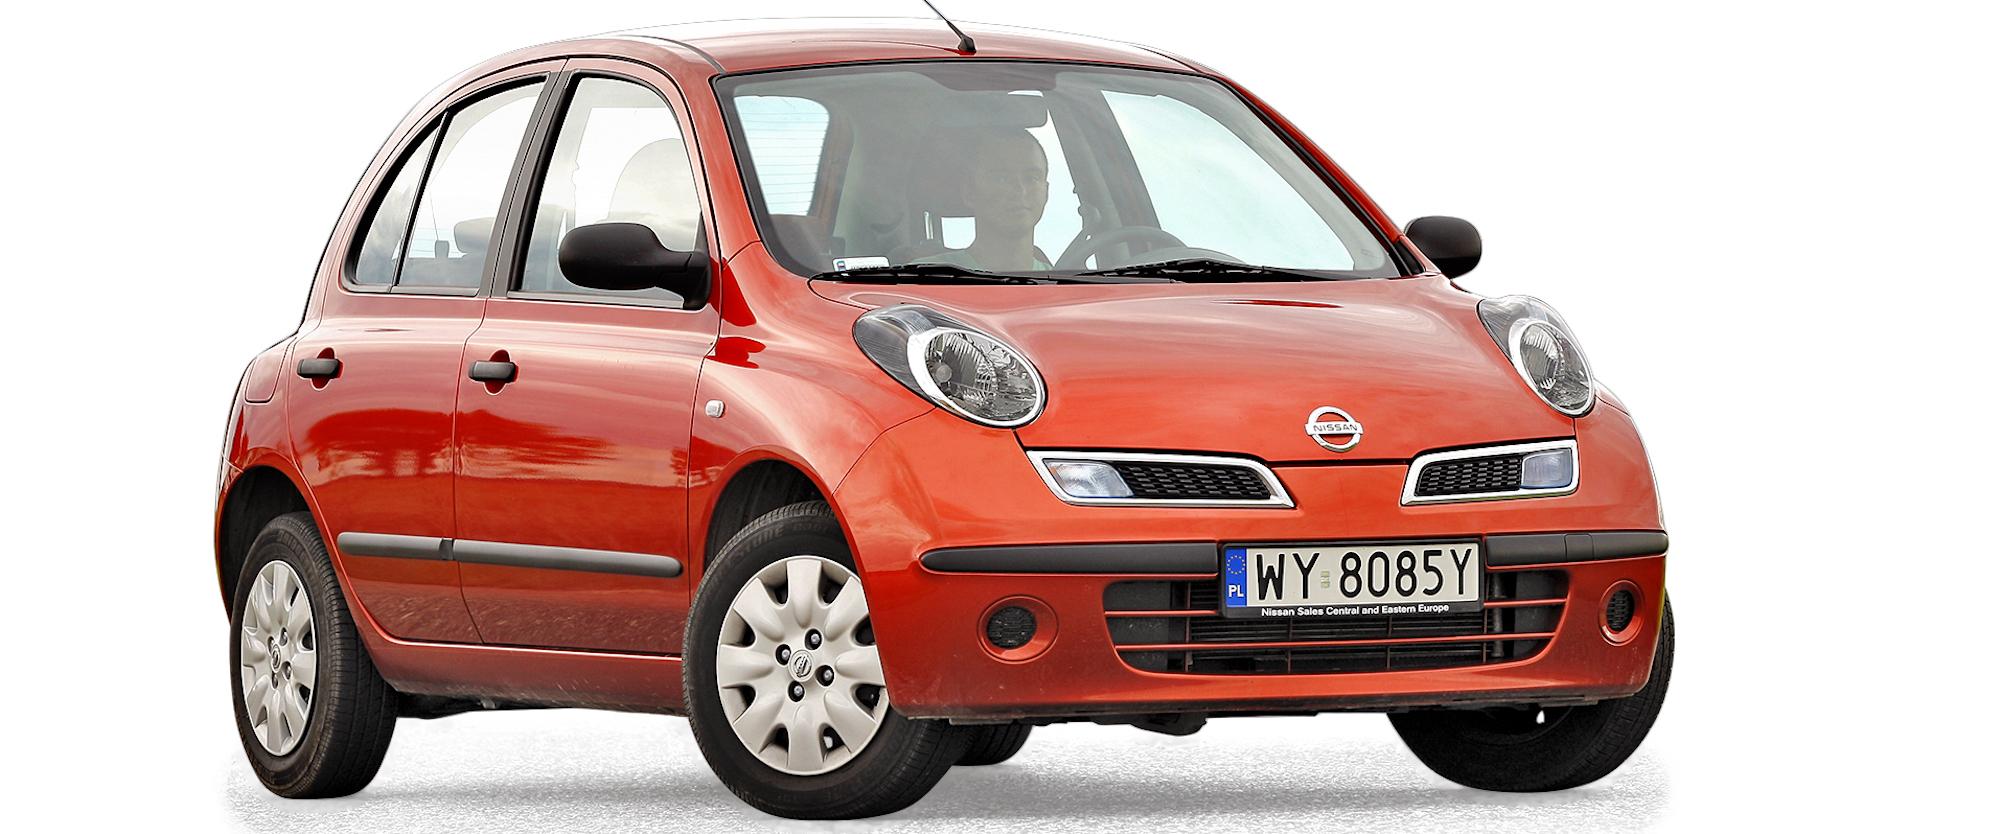 Nissan Micra K12 (2003-2010)